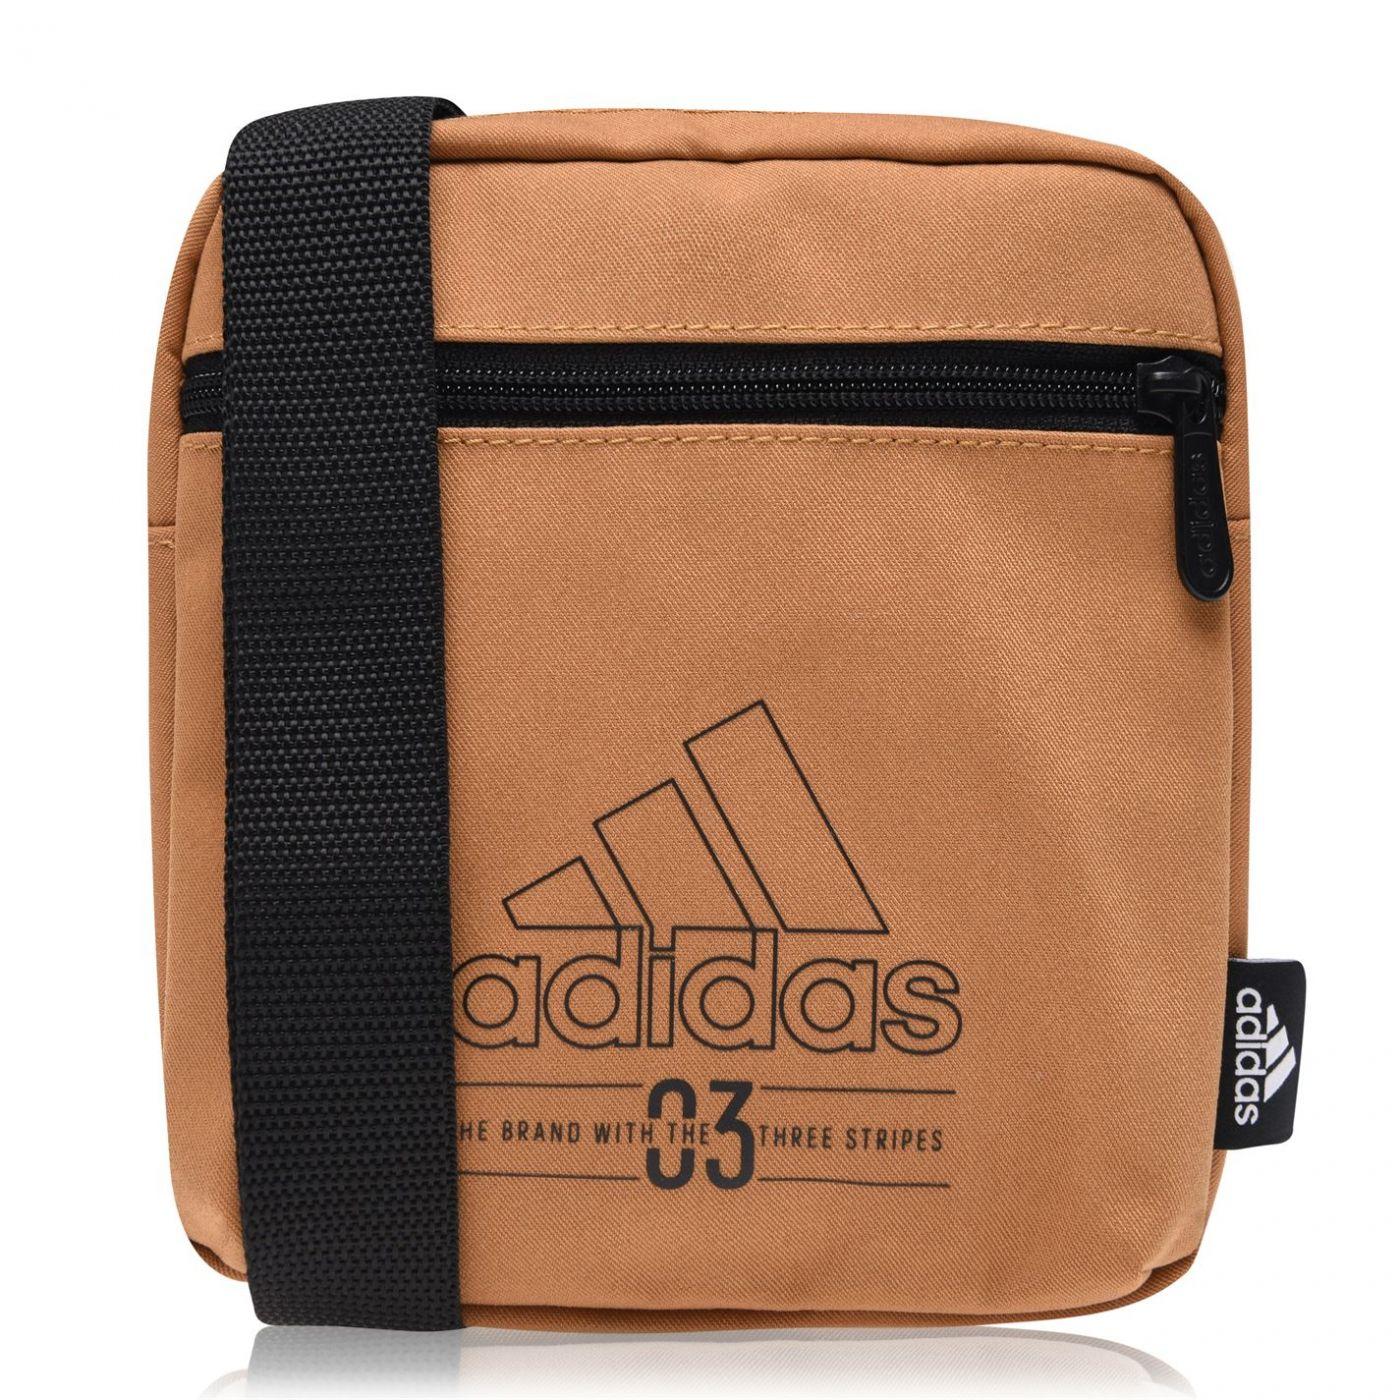 Adidas Brilliant Basics Organiser Bag